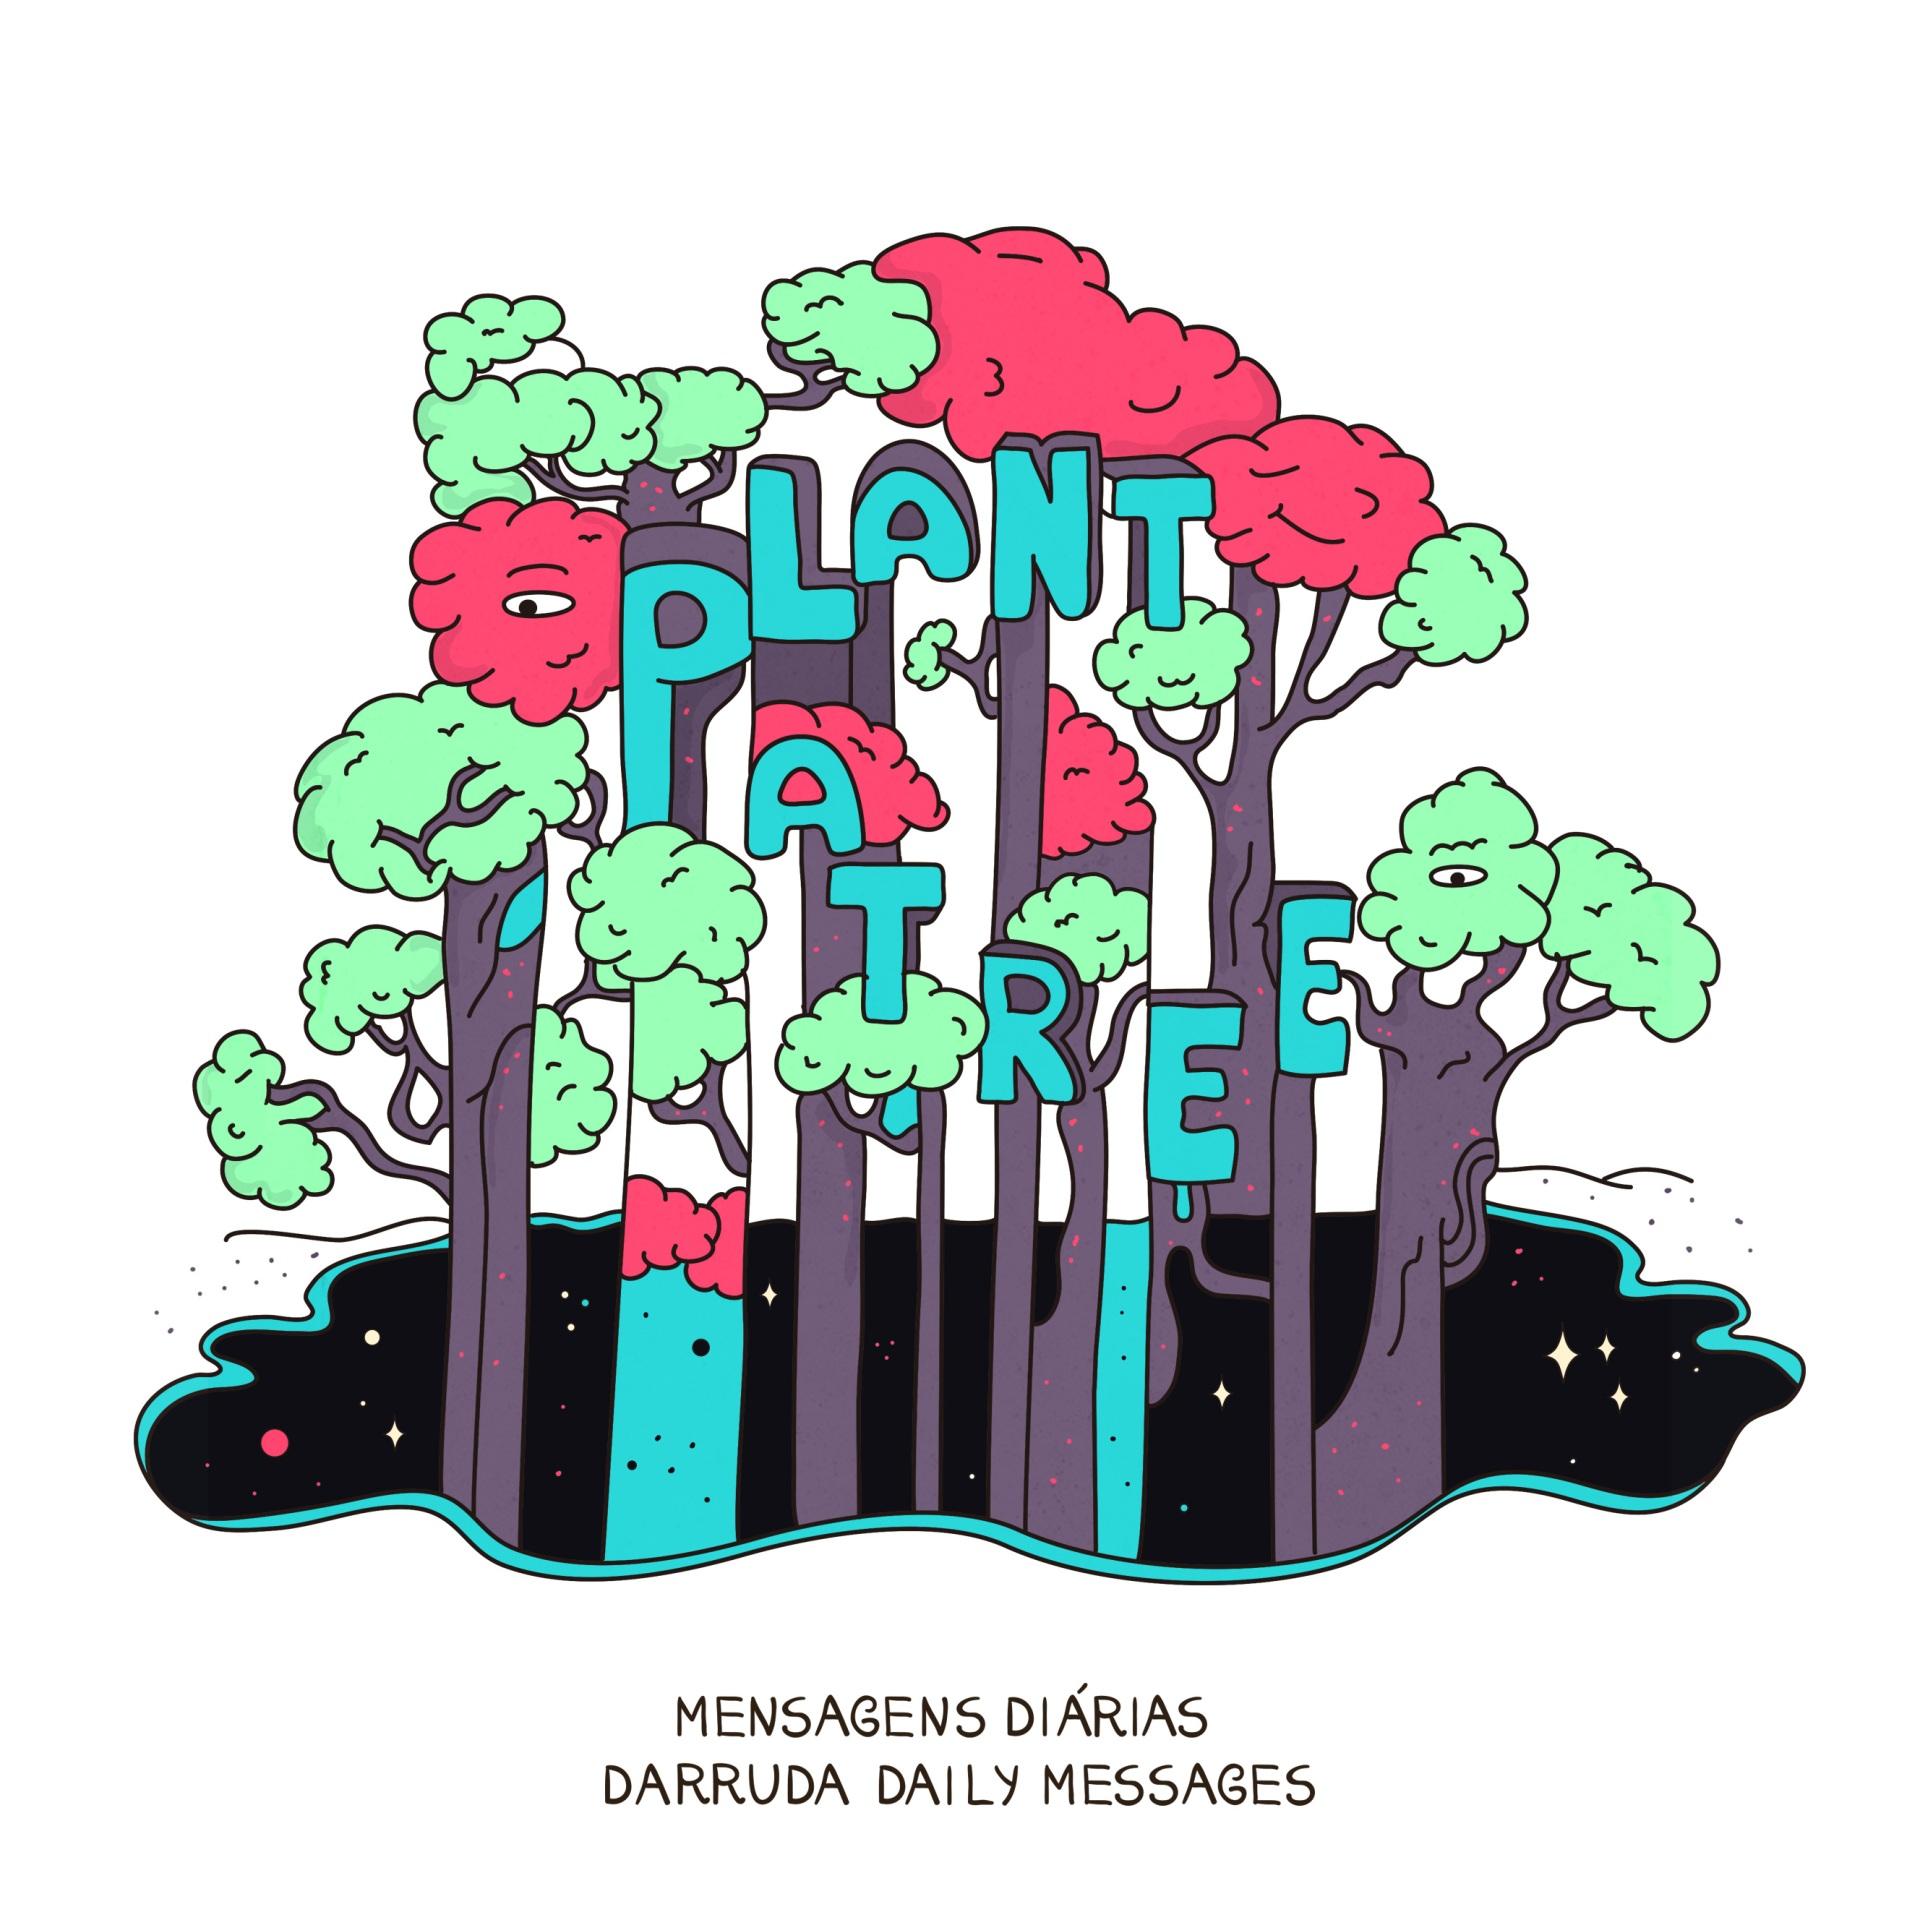 plantatree1a